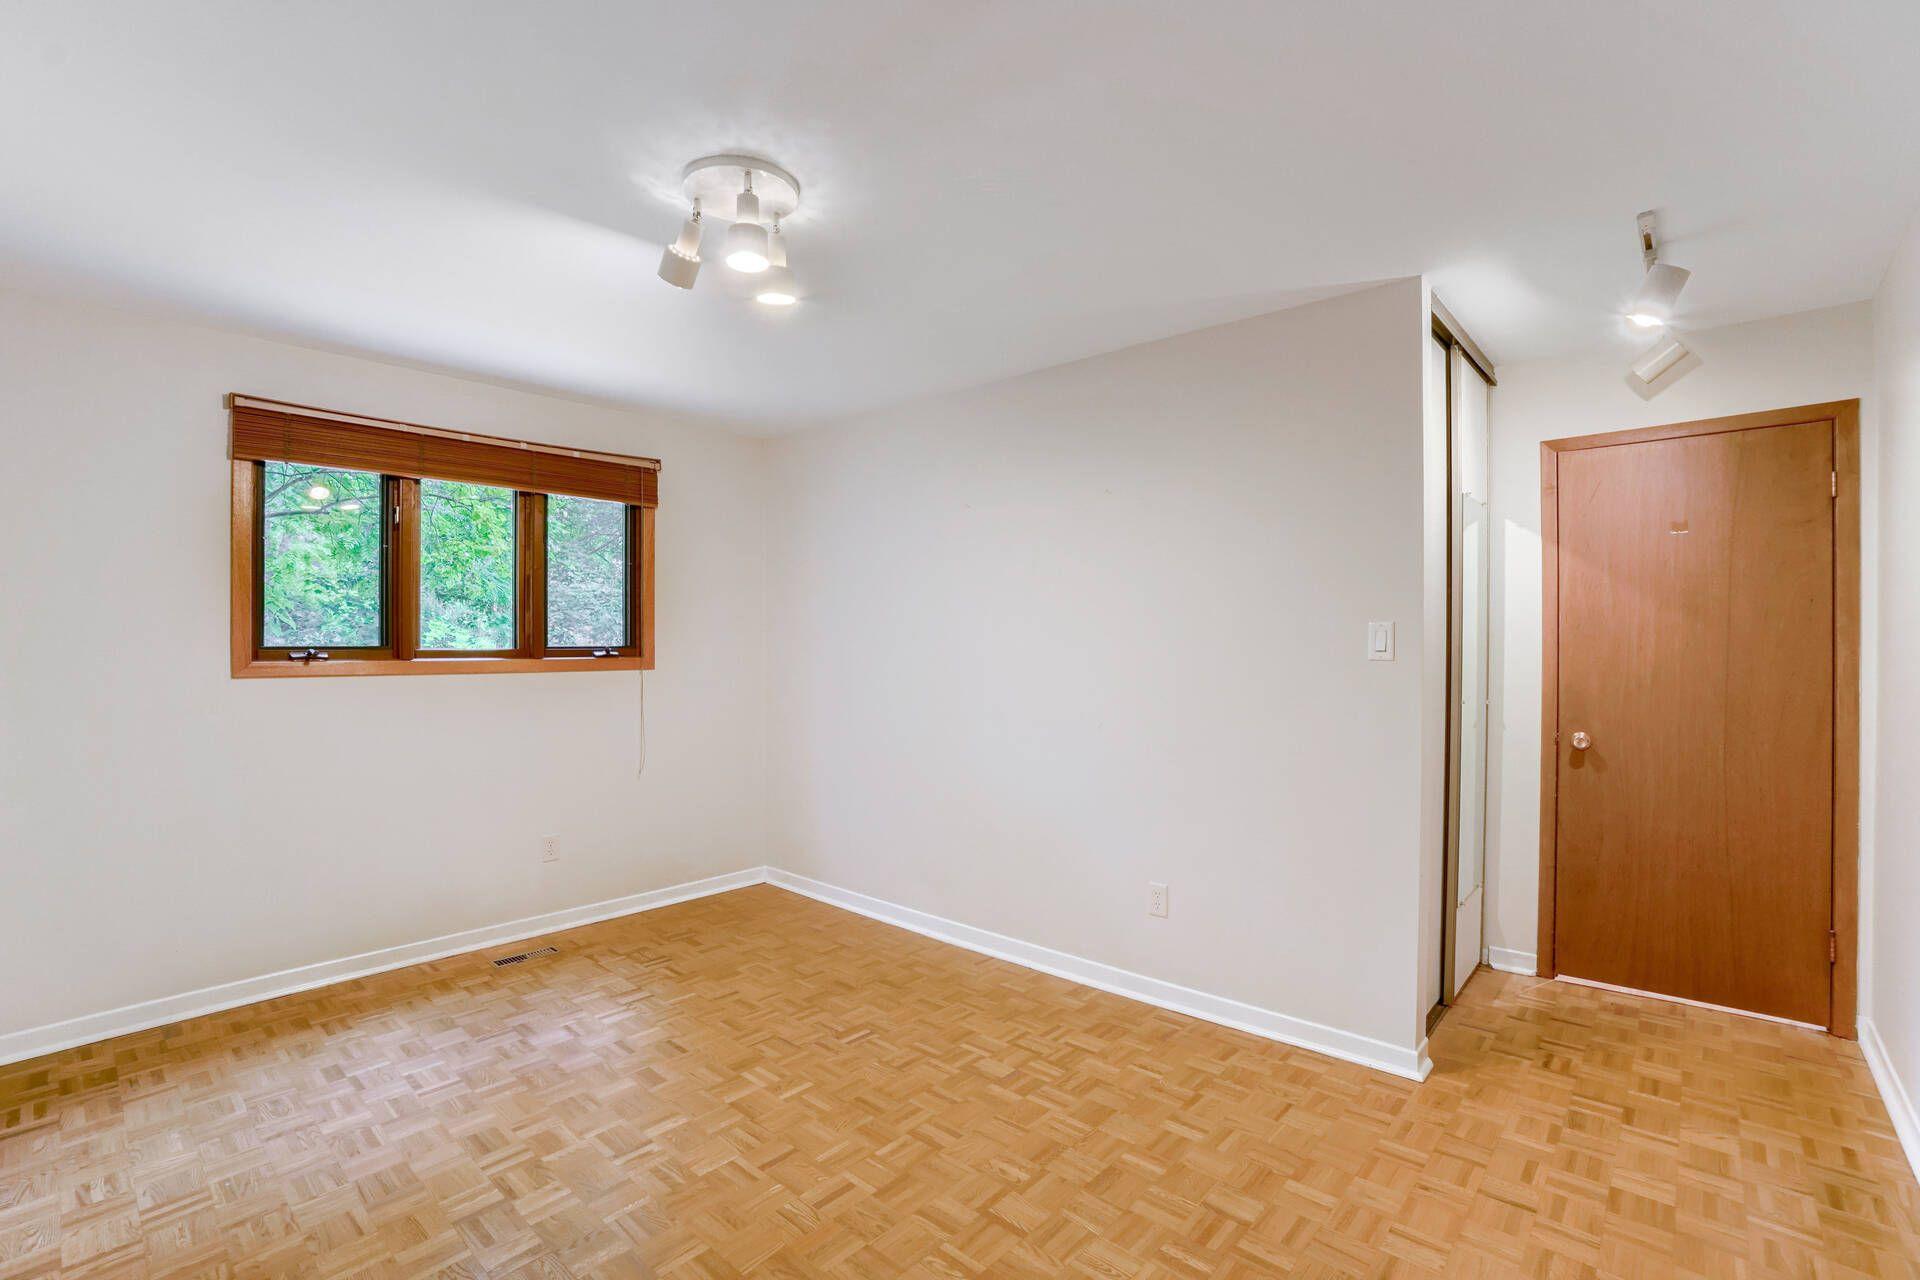 4th Bedroom - 169 Wedgewood Dr, Oakville - Elite3 & Team at 169 Wedgewood Drive, Eastlake, Oakville